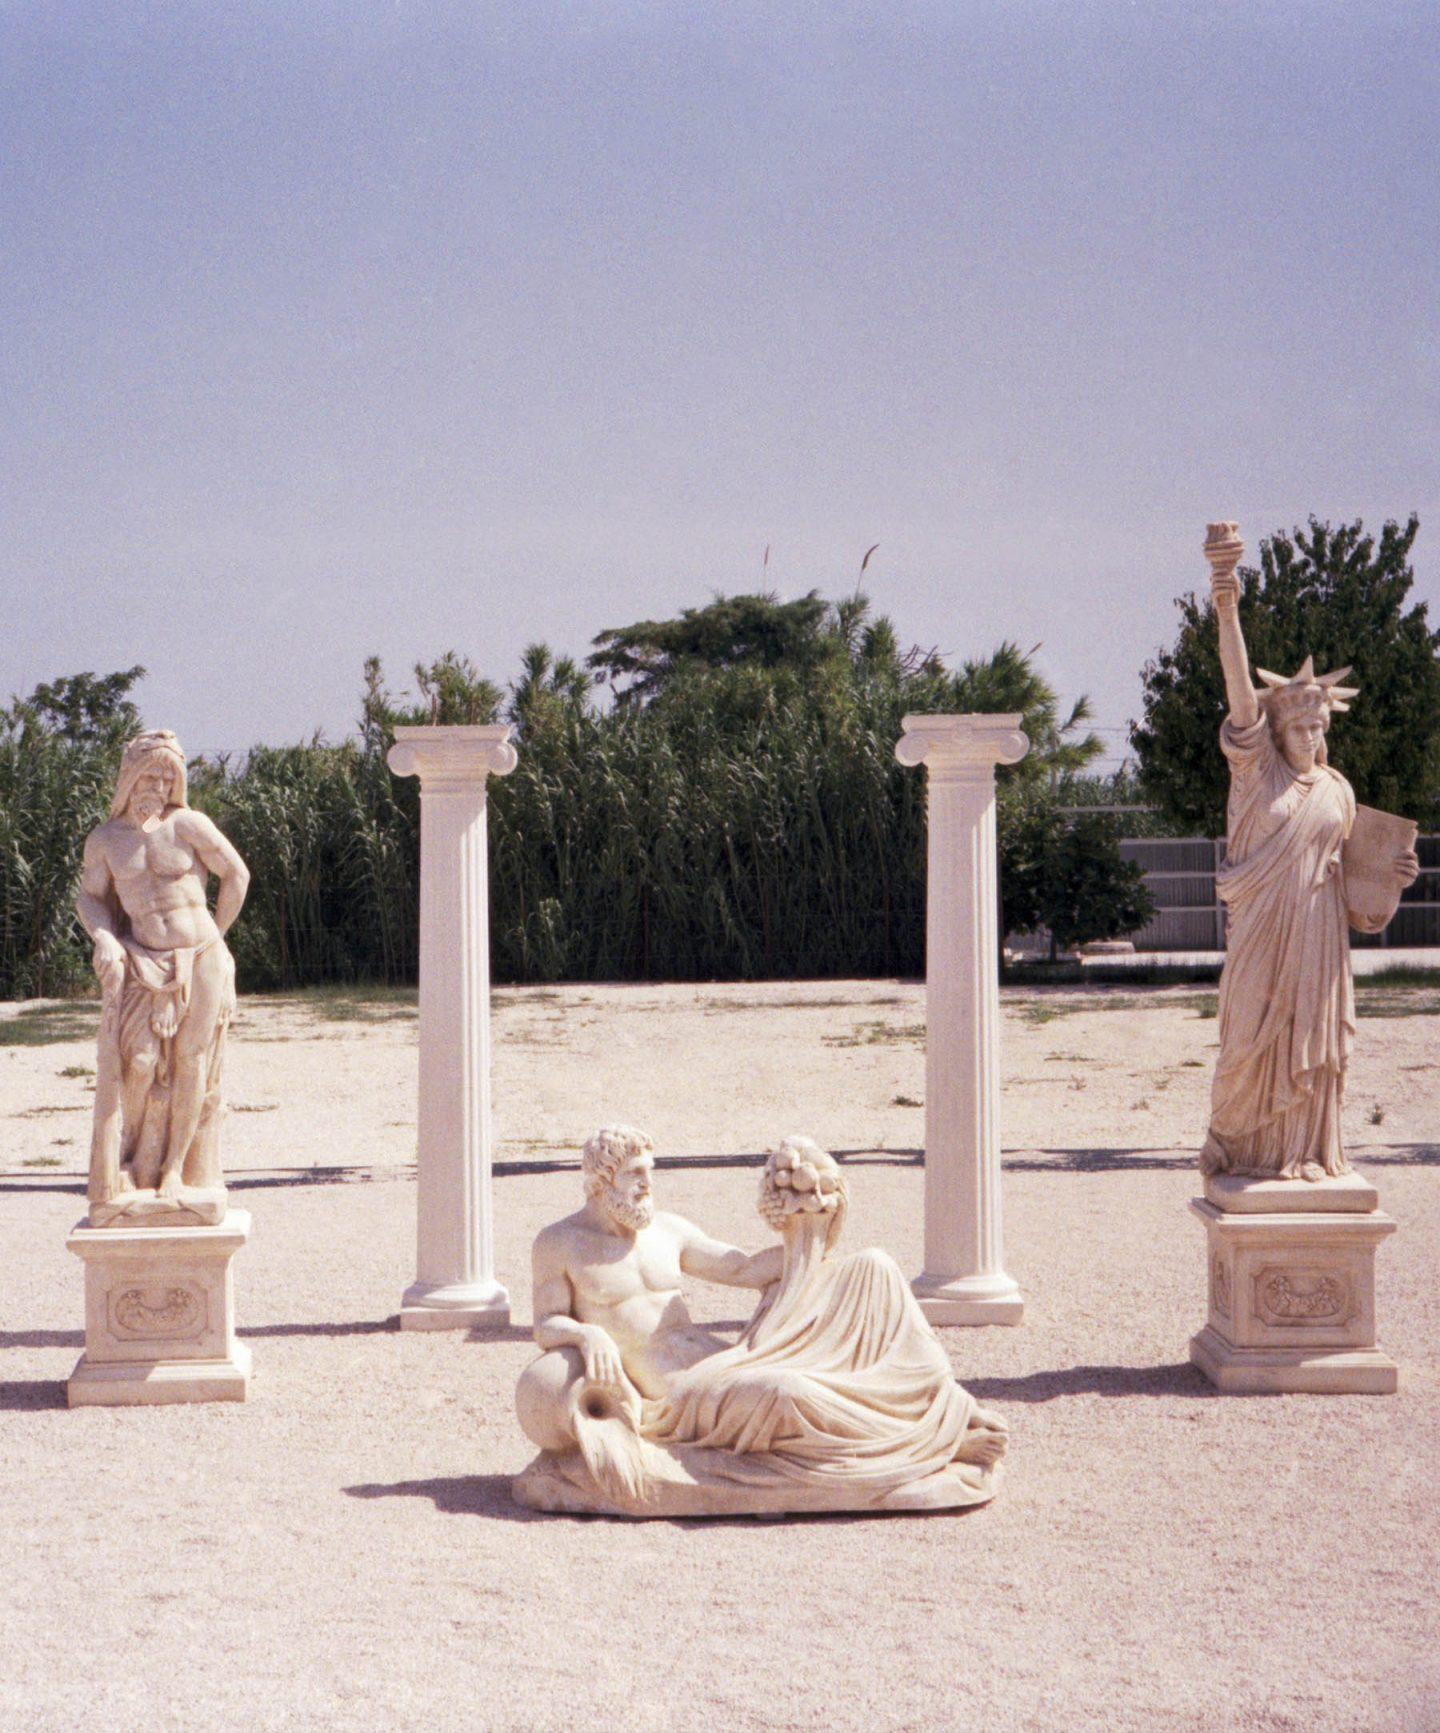 iGNANT-Stefan-Giftthaler-Statues-04